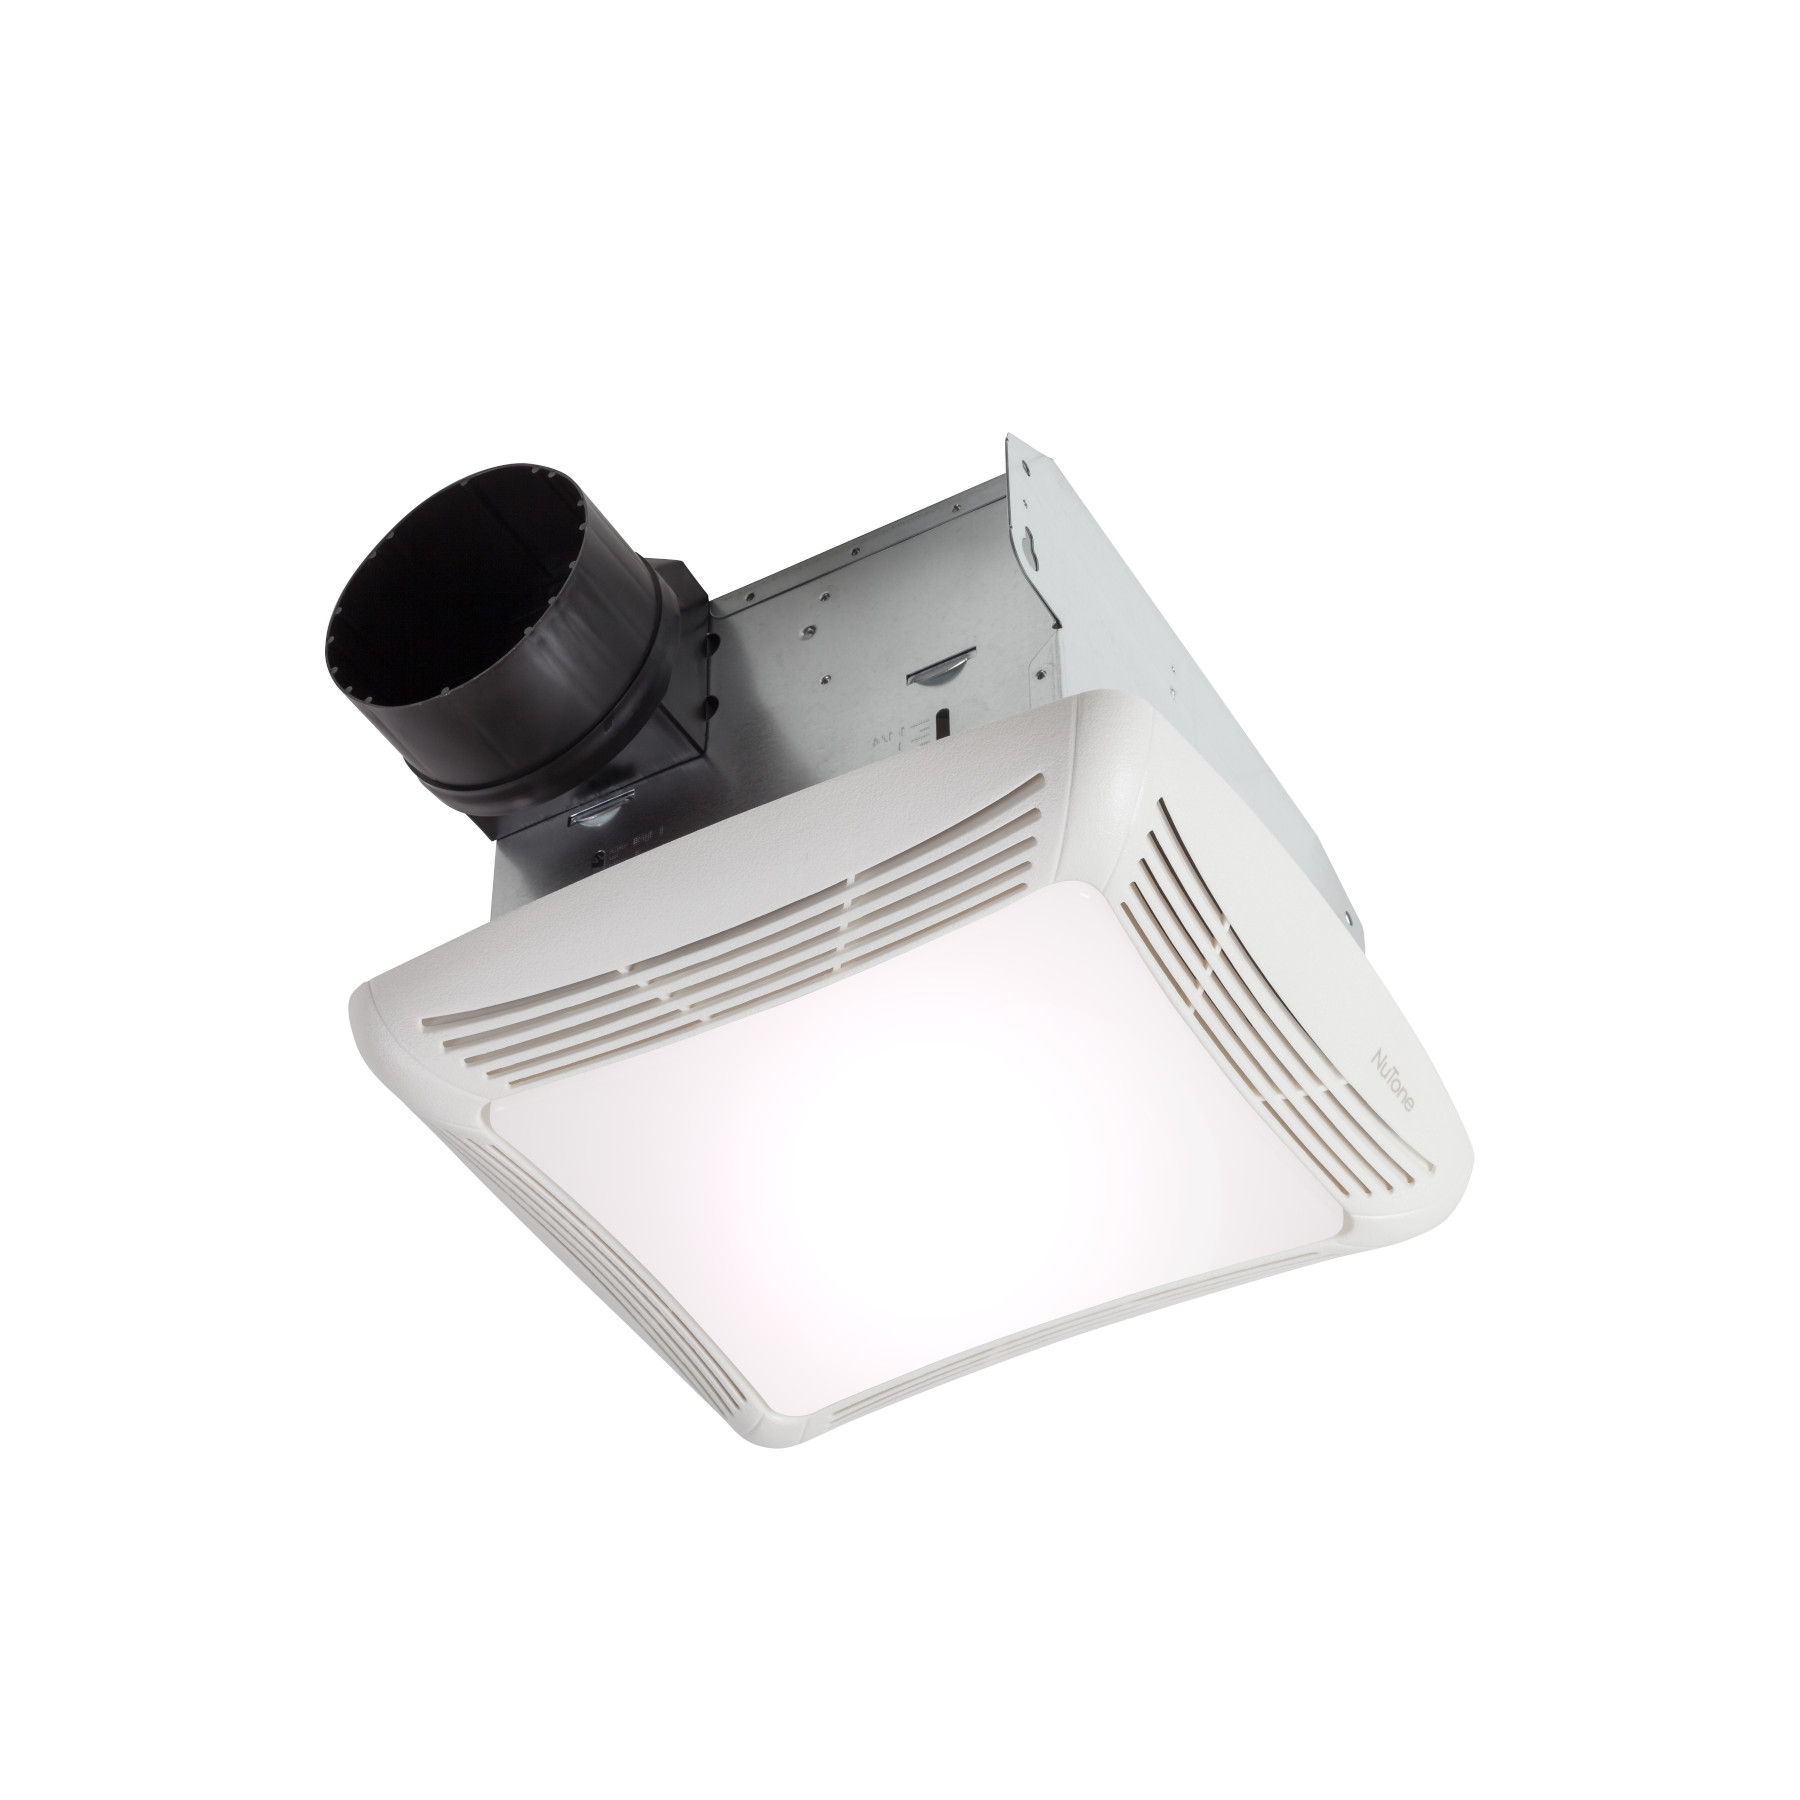 763 nutone 50 cfm ventilation fan with